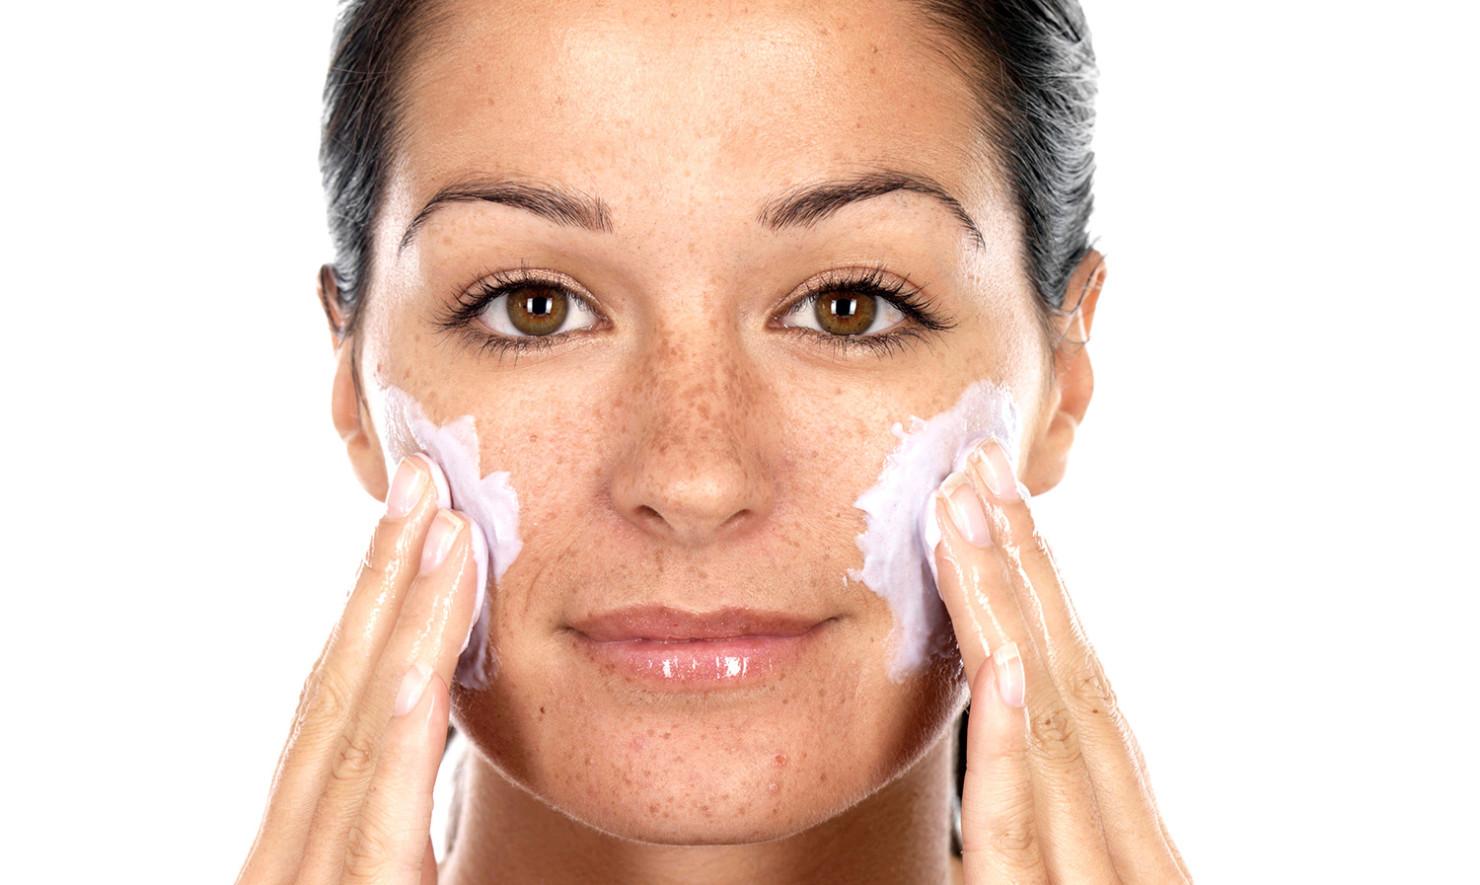 Benefits Of Oatmeal Soap